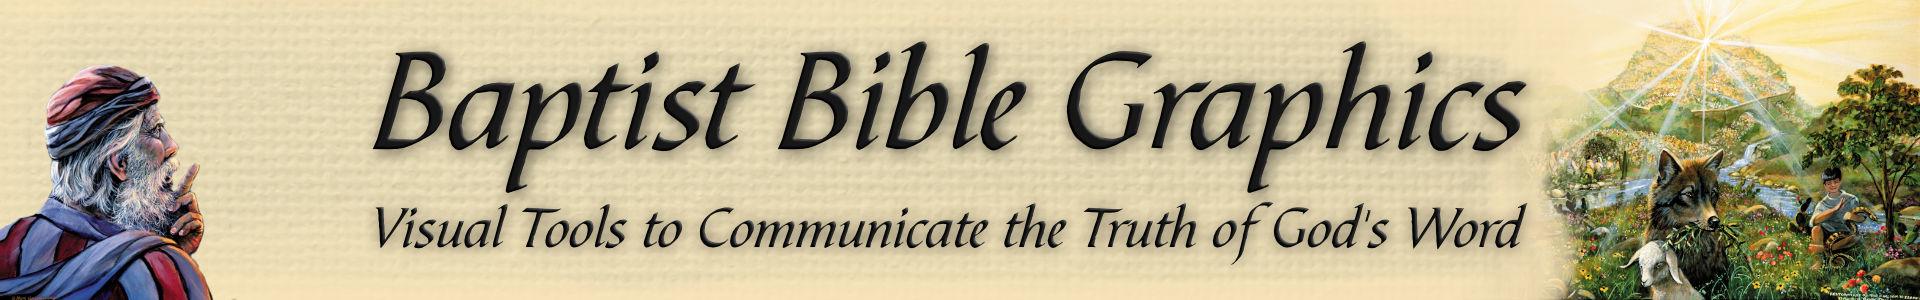 Baptist Bible Graphics